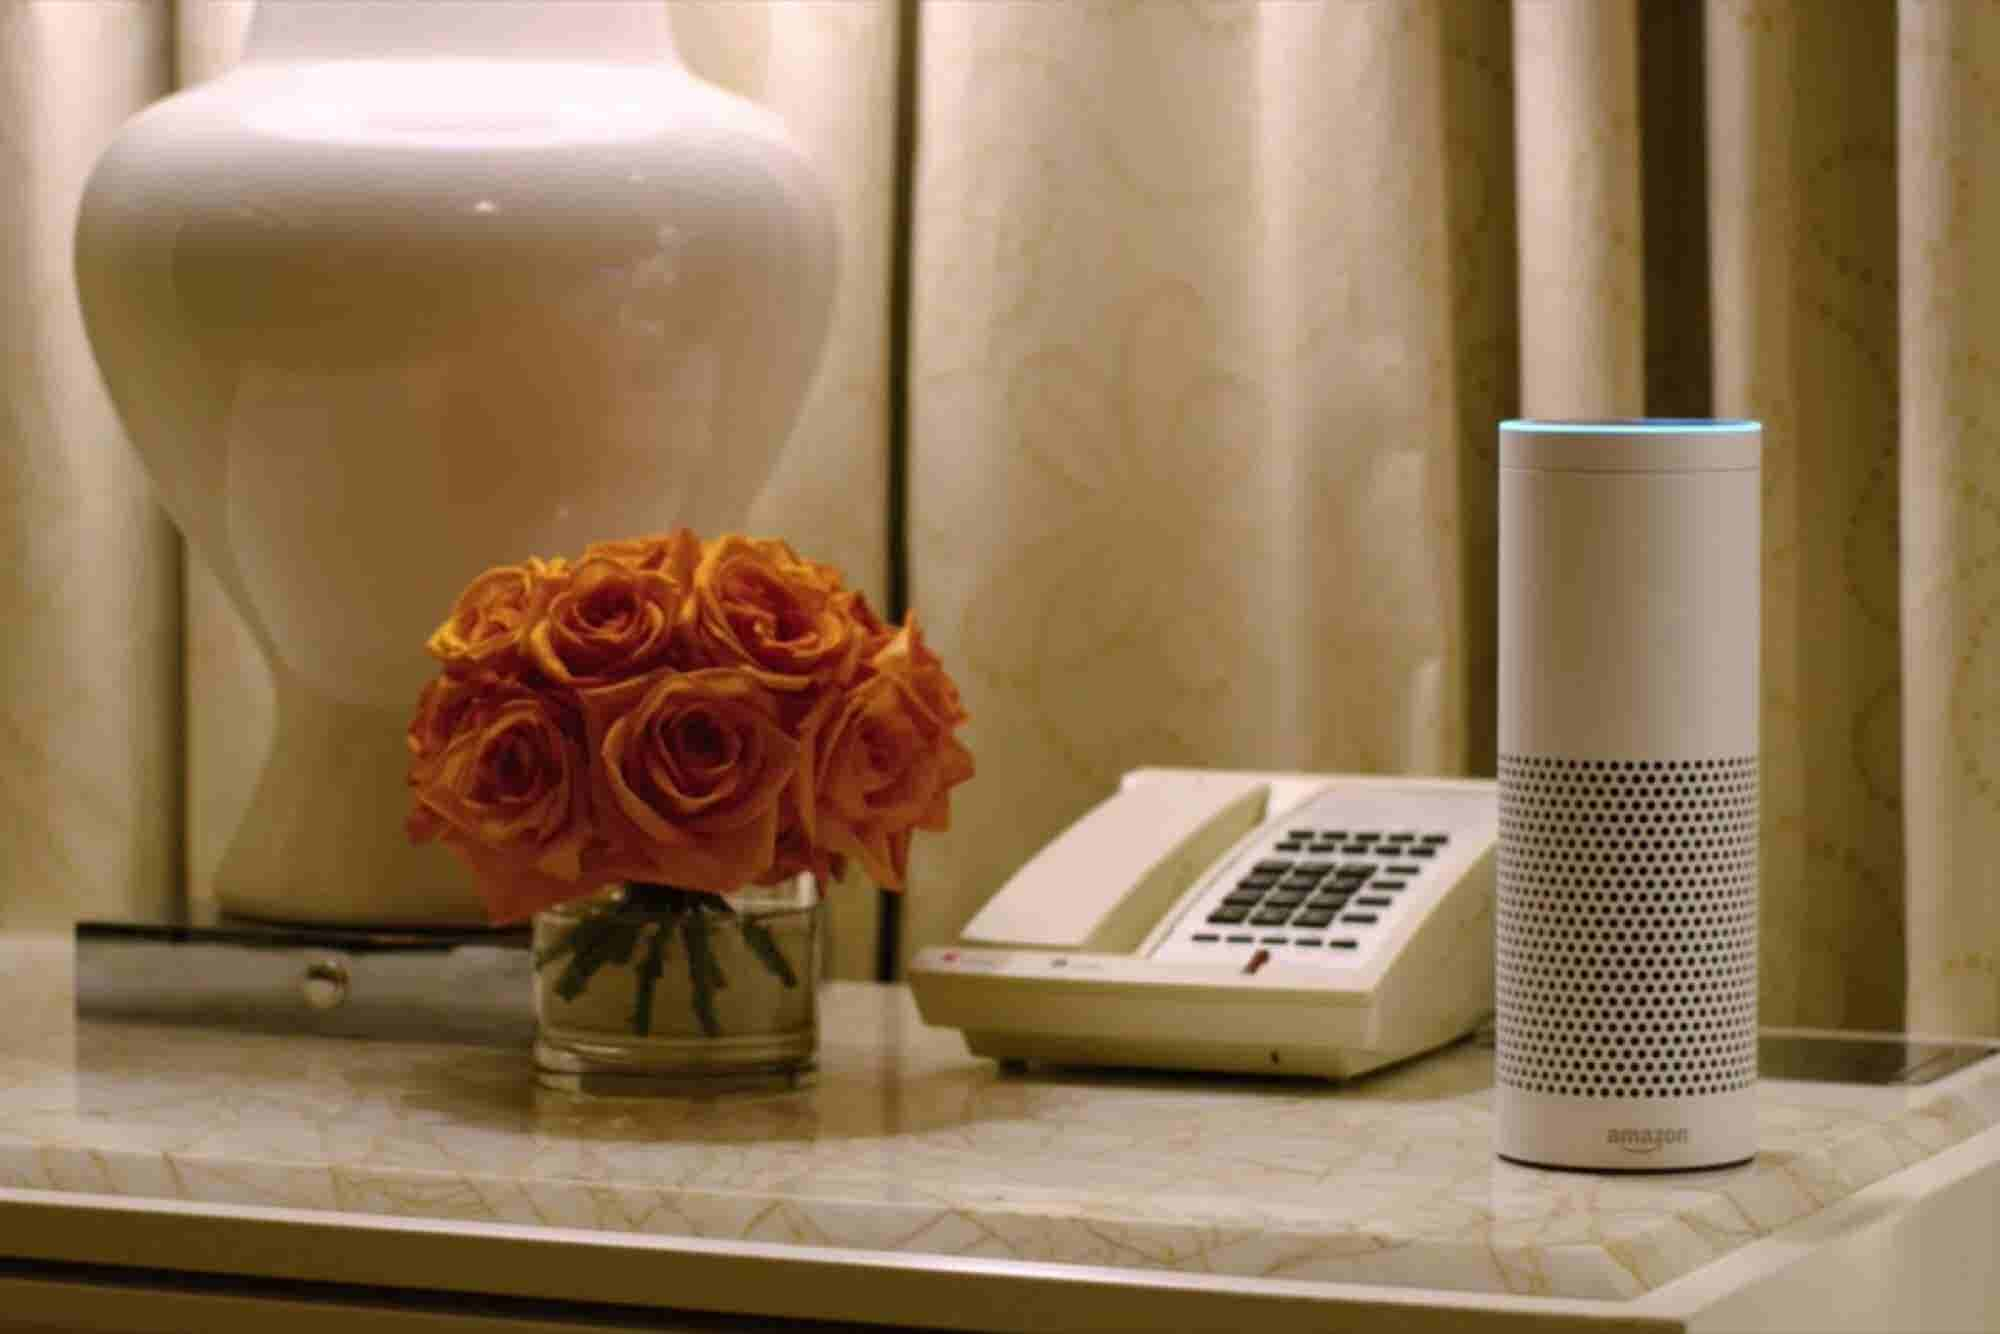 Wynn Las Vegas Adding Amazon Echo to All Rooms